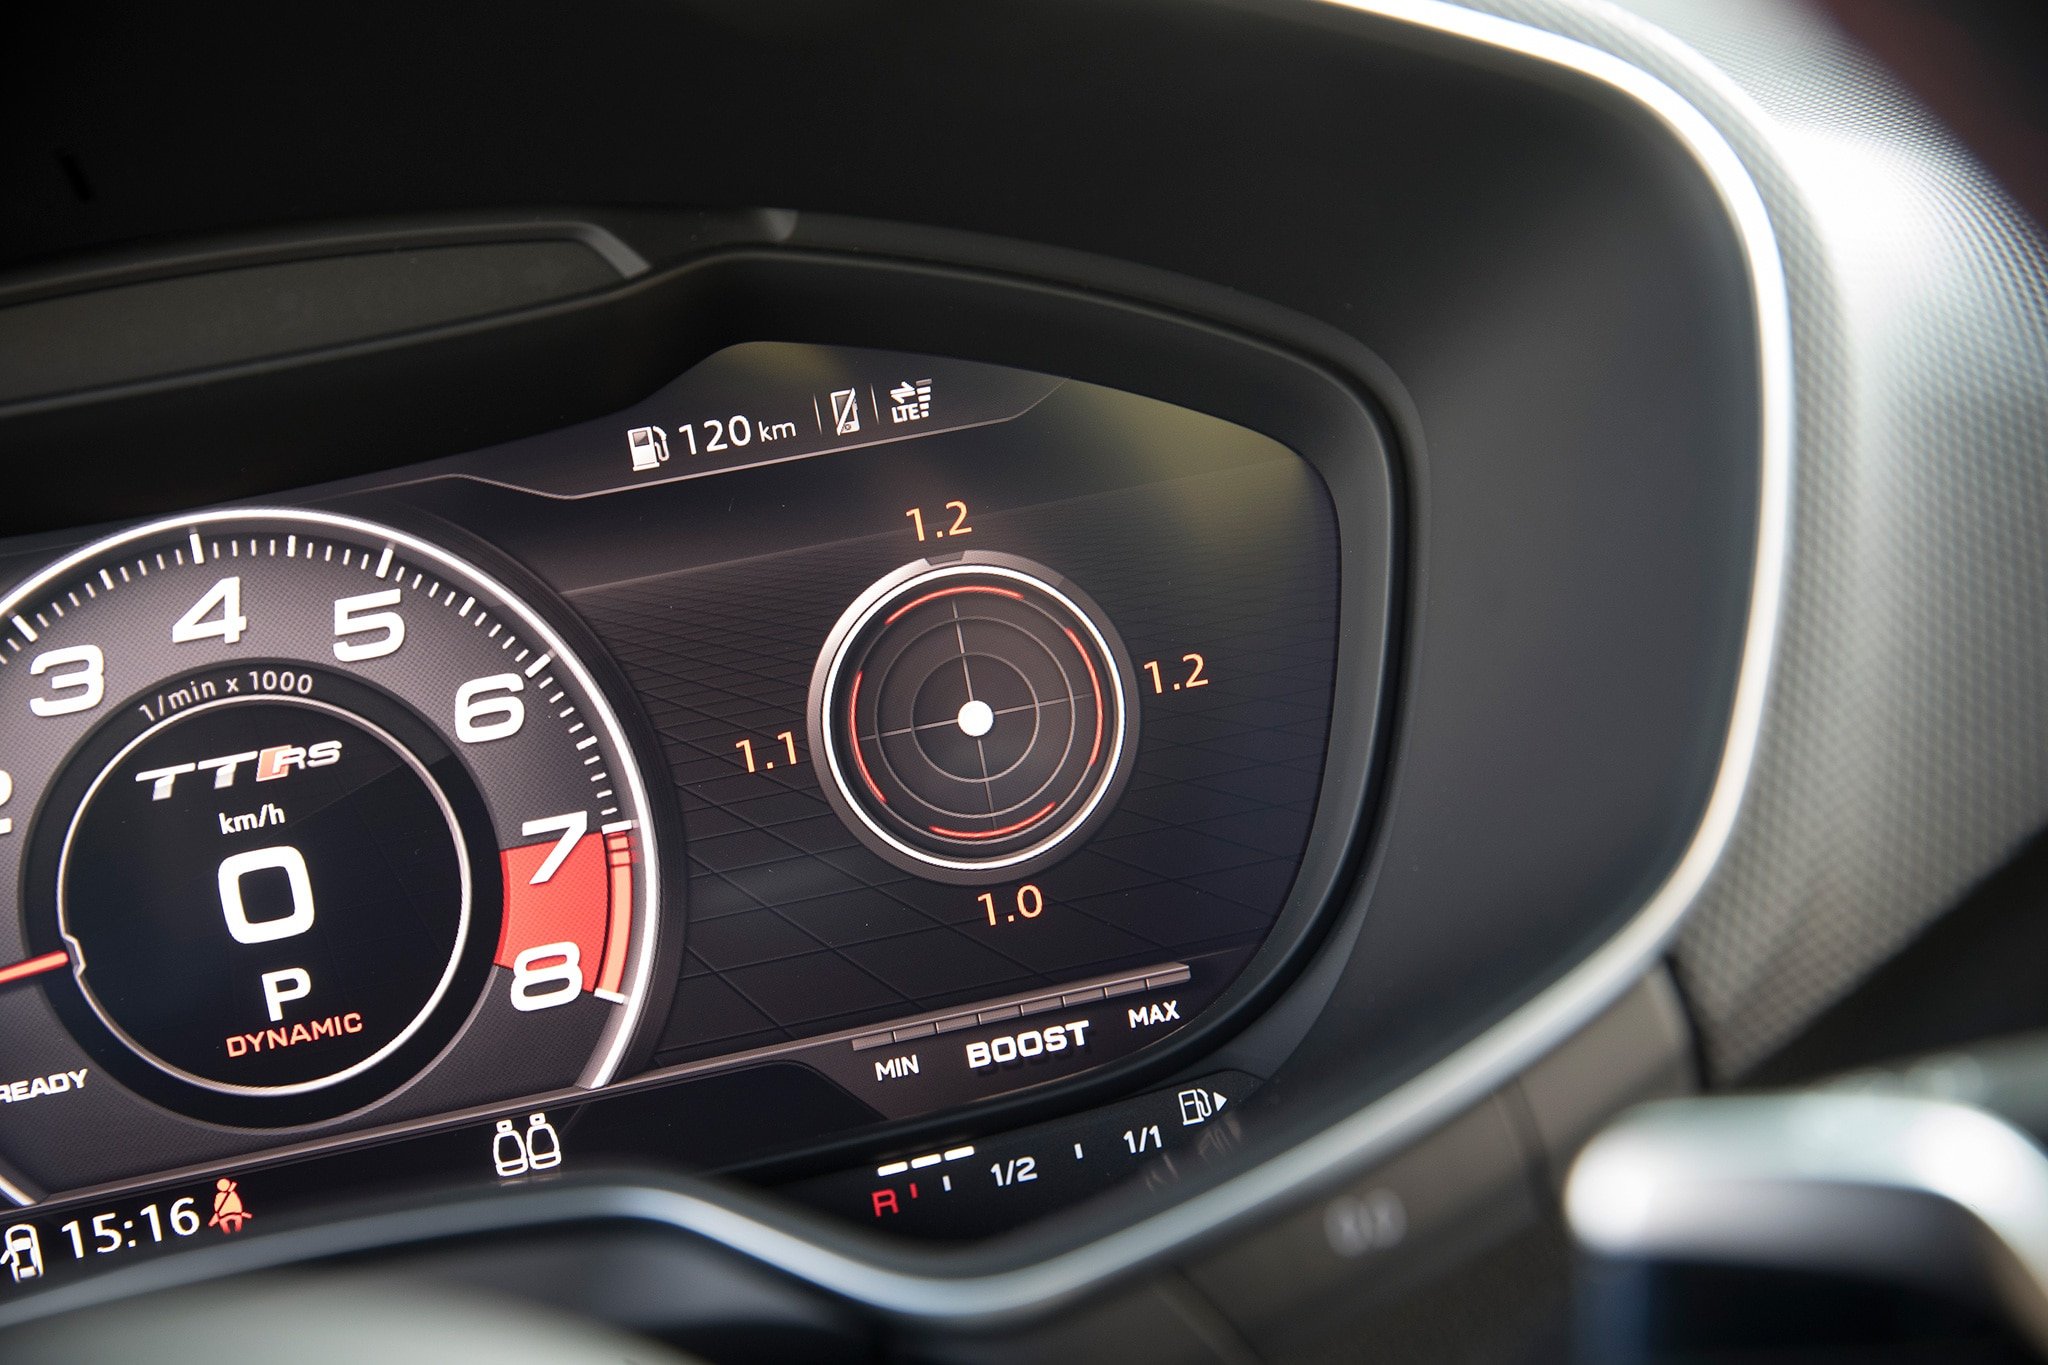 2018 Audi TT RS Instrument Panel 01